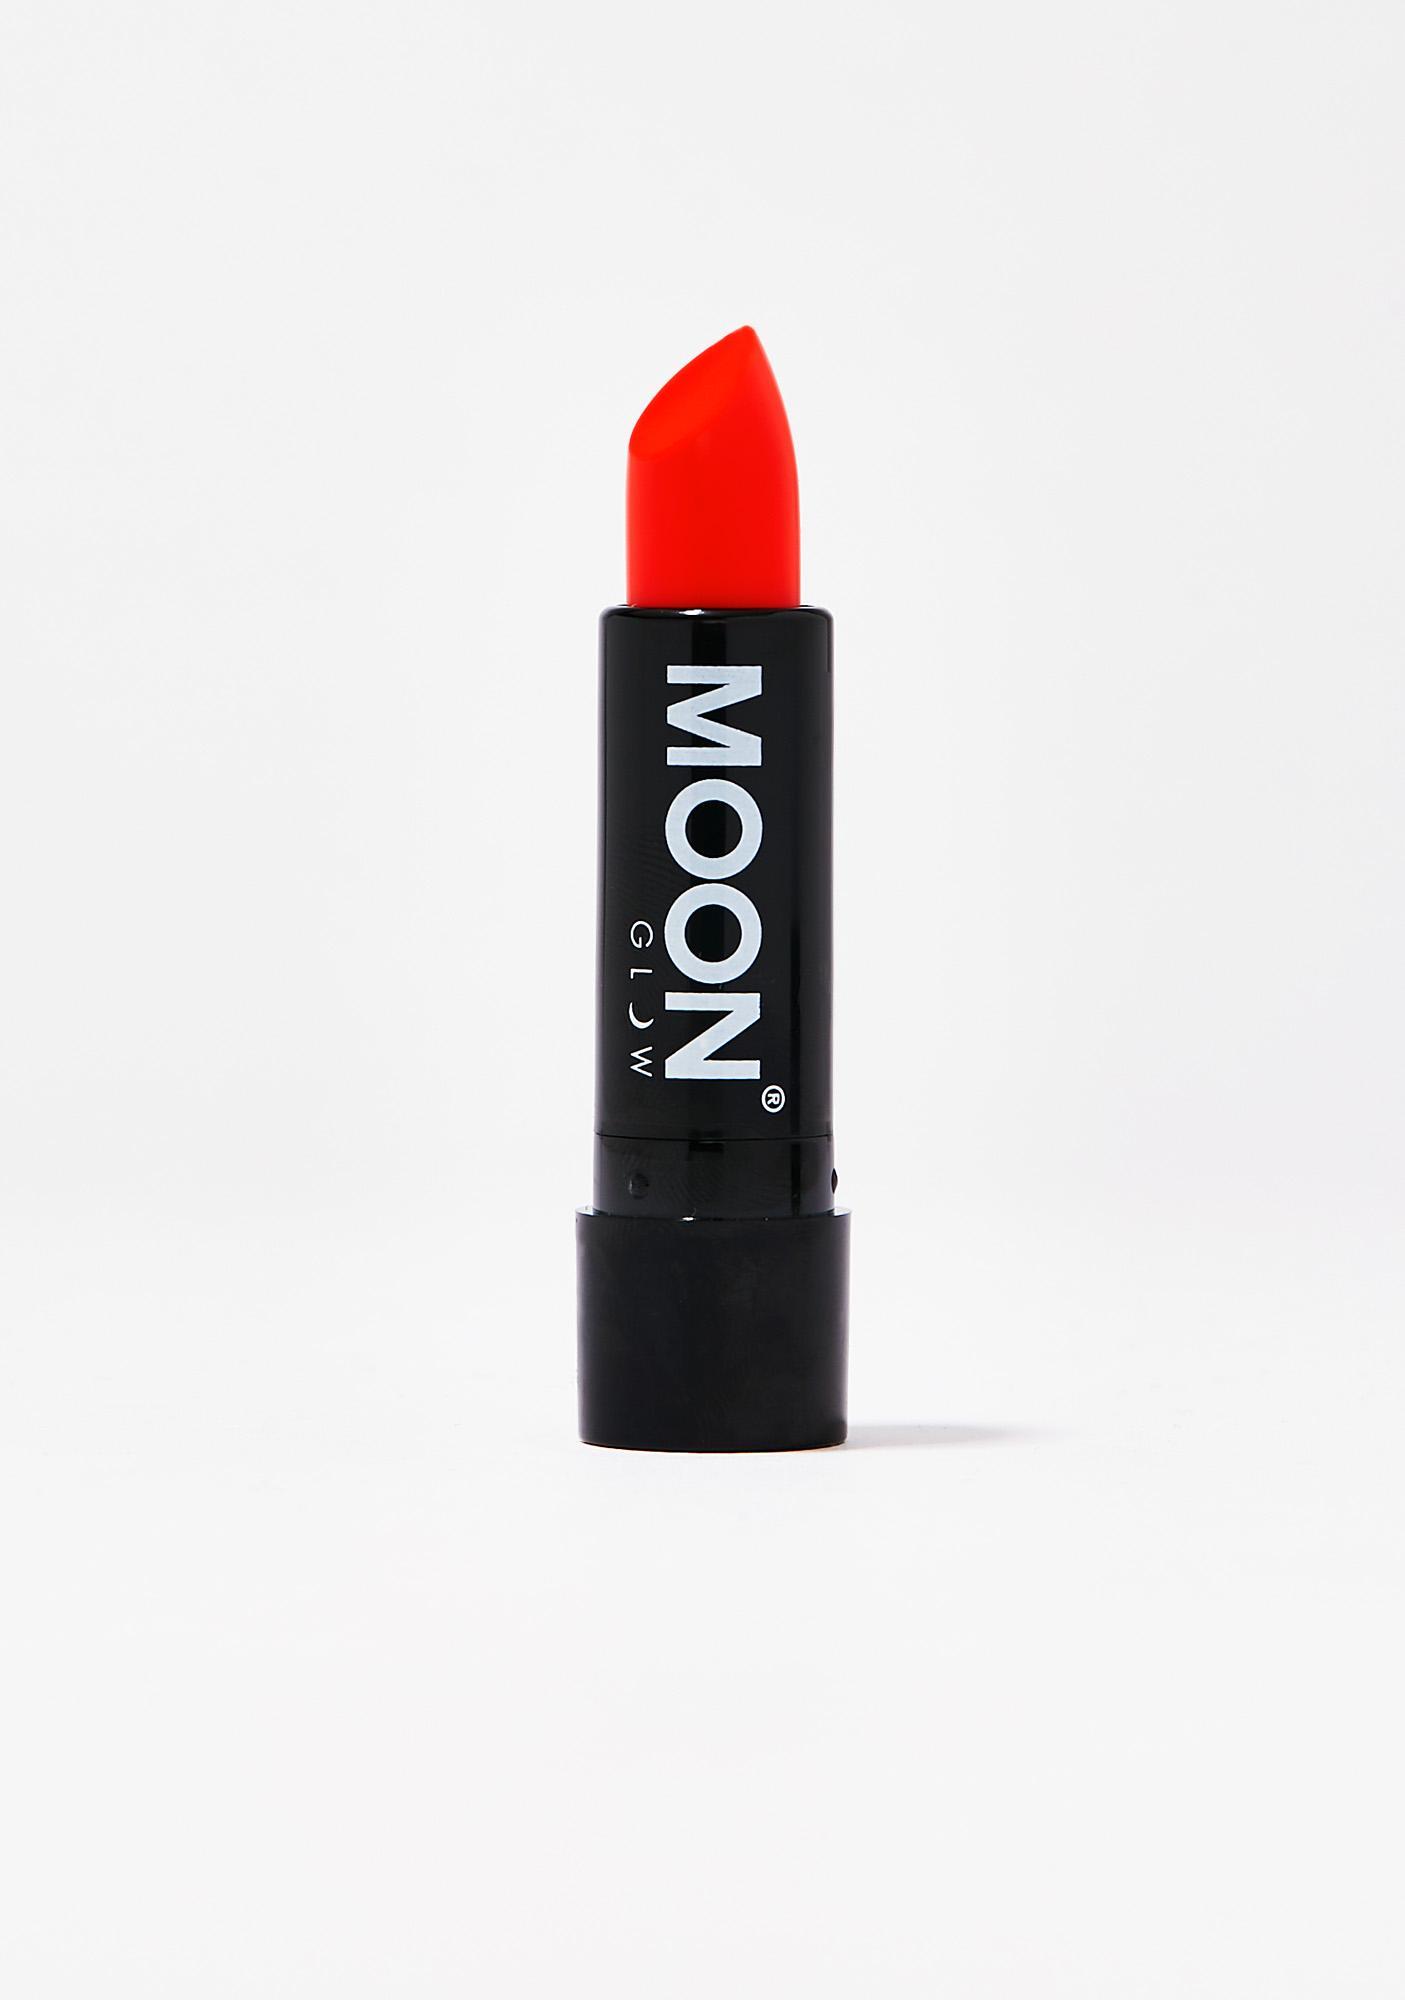 Moon Creations Neon Red UV Lipstick